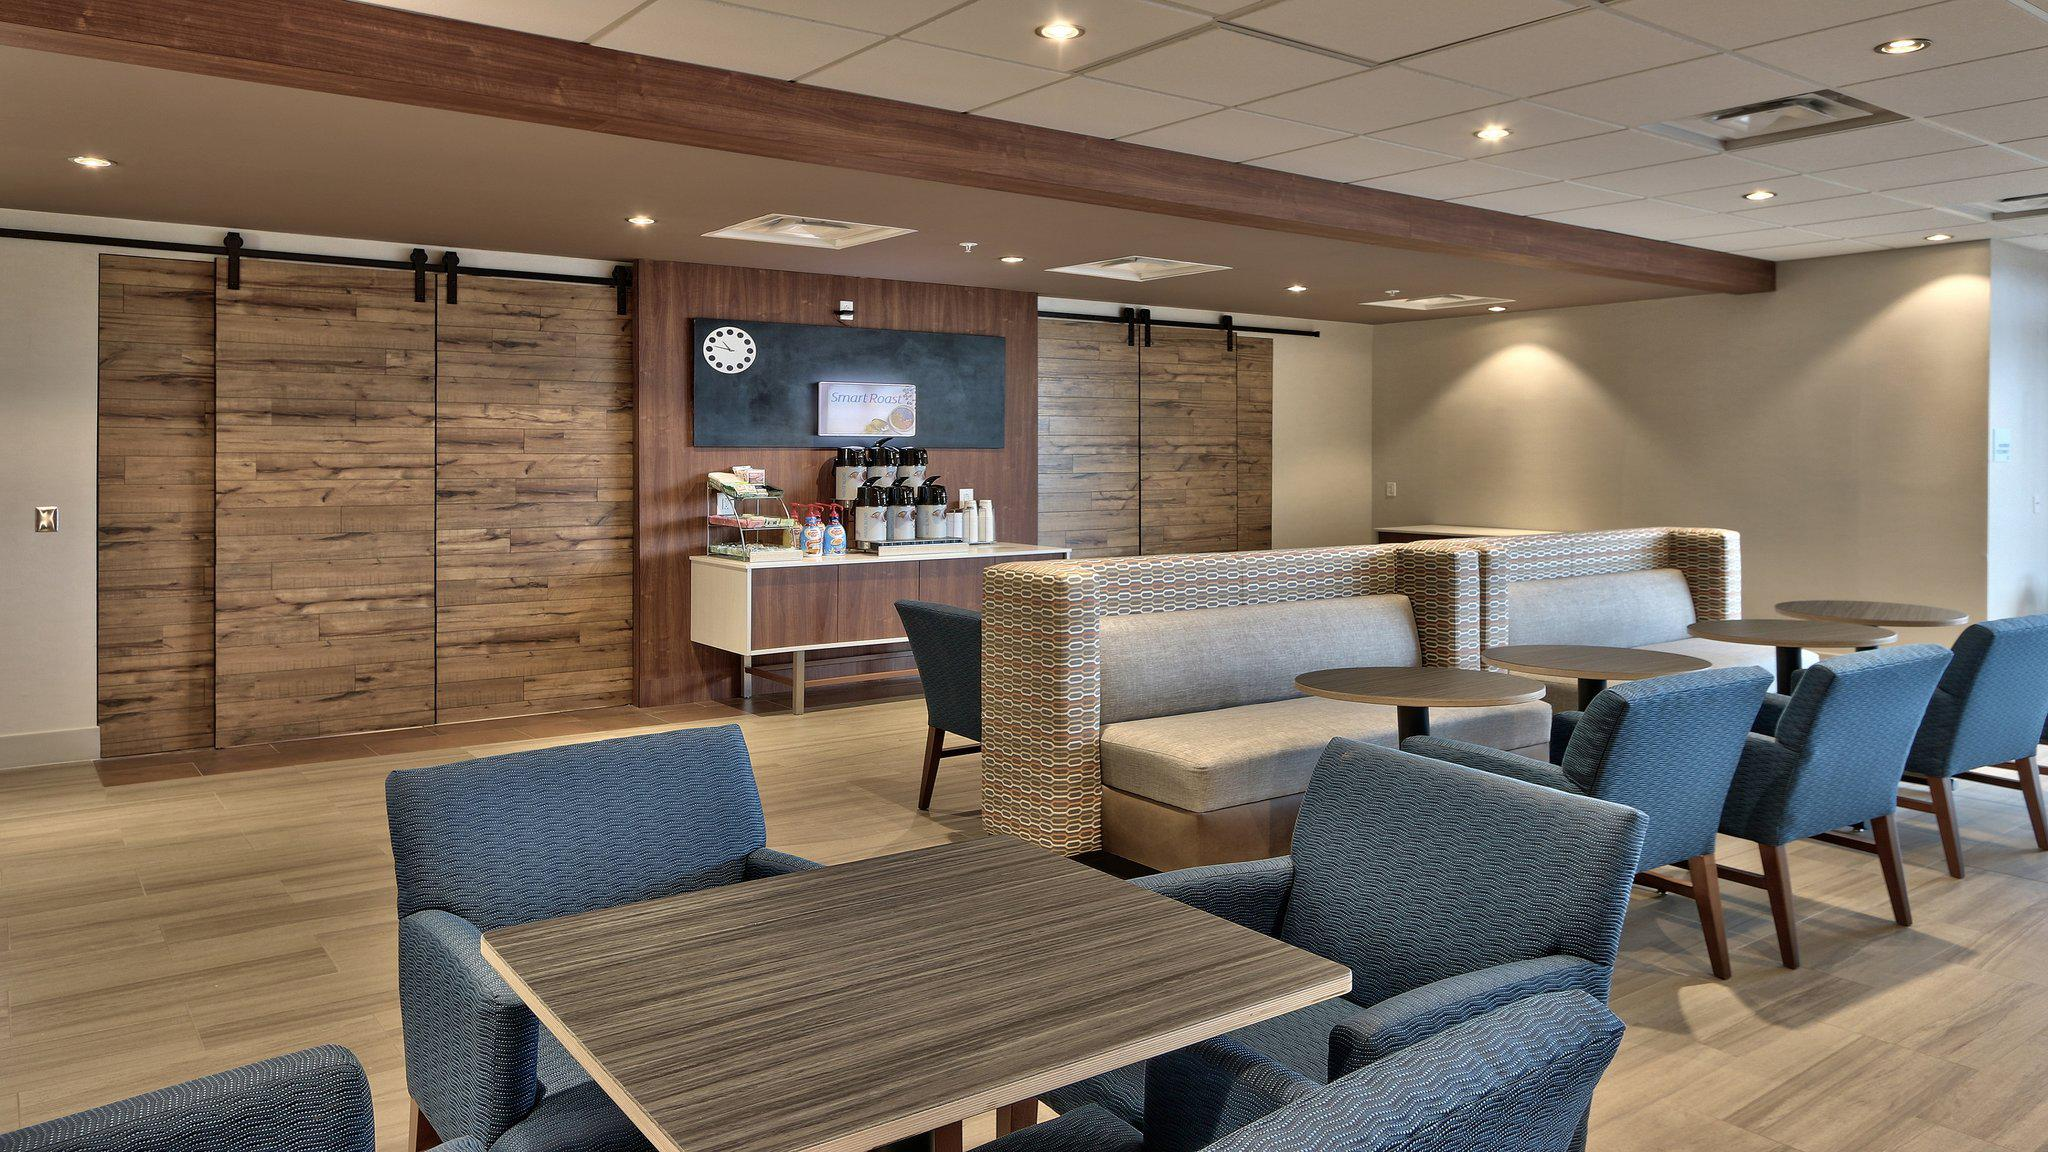 Holiday Inn Express & Suites Denver Northwest - Broomfield, an IHG Hotel